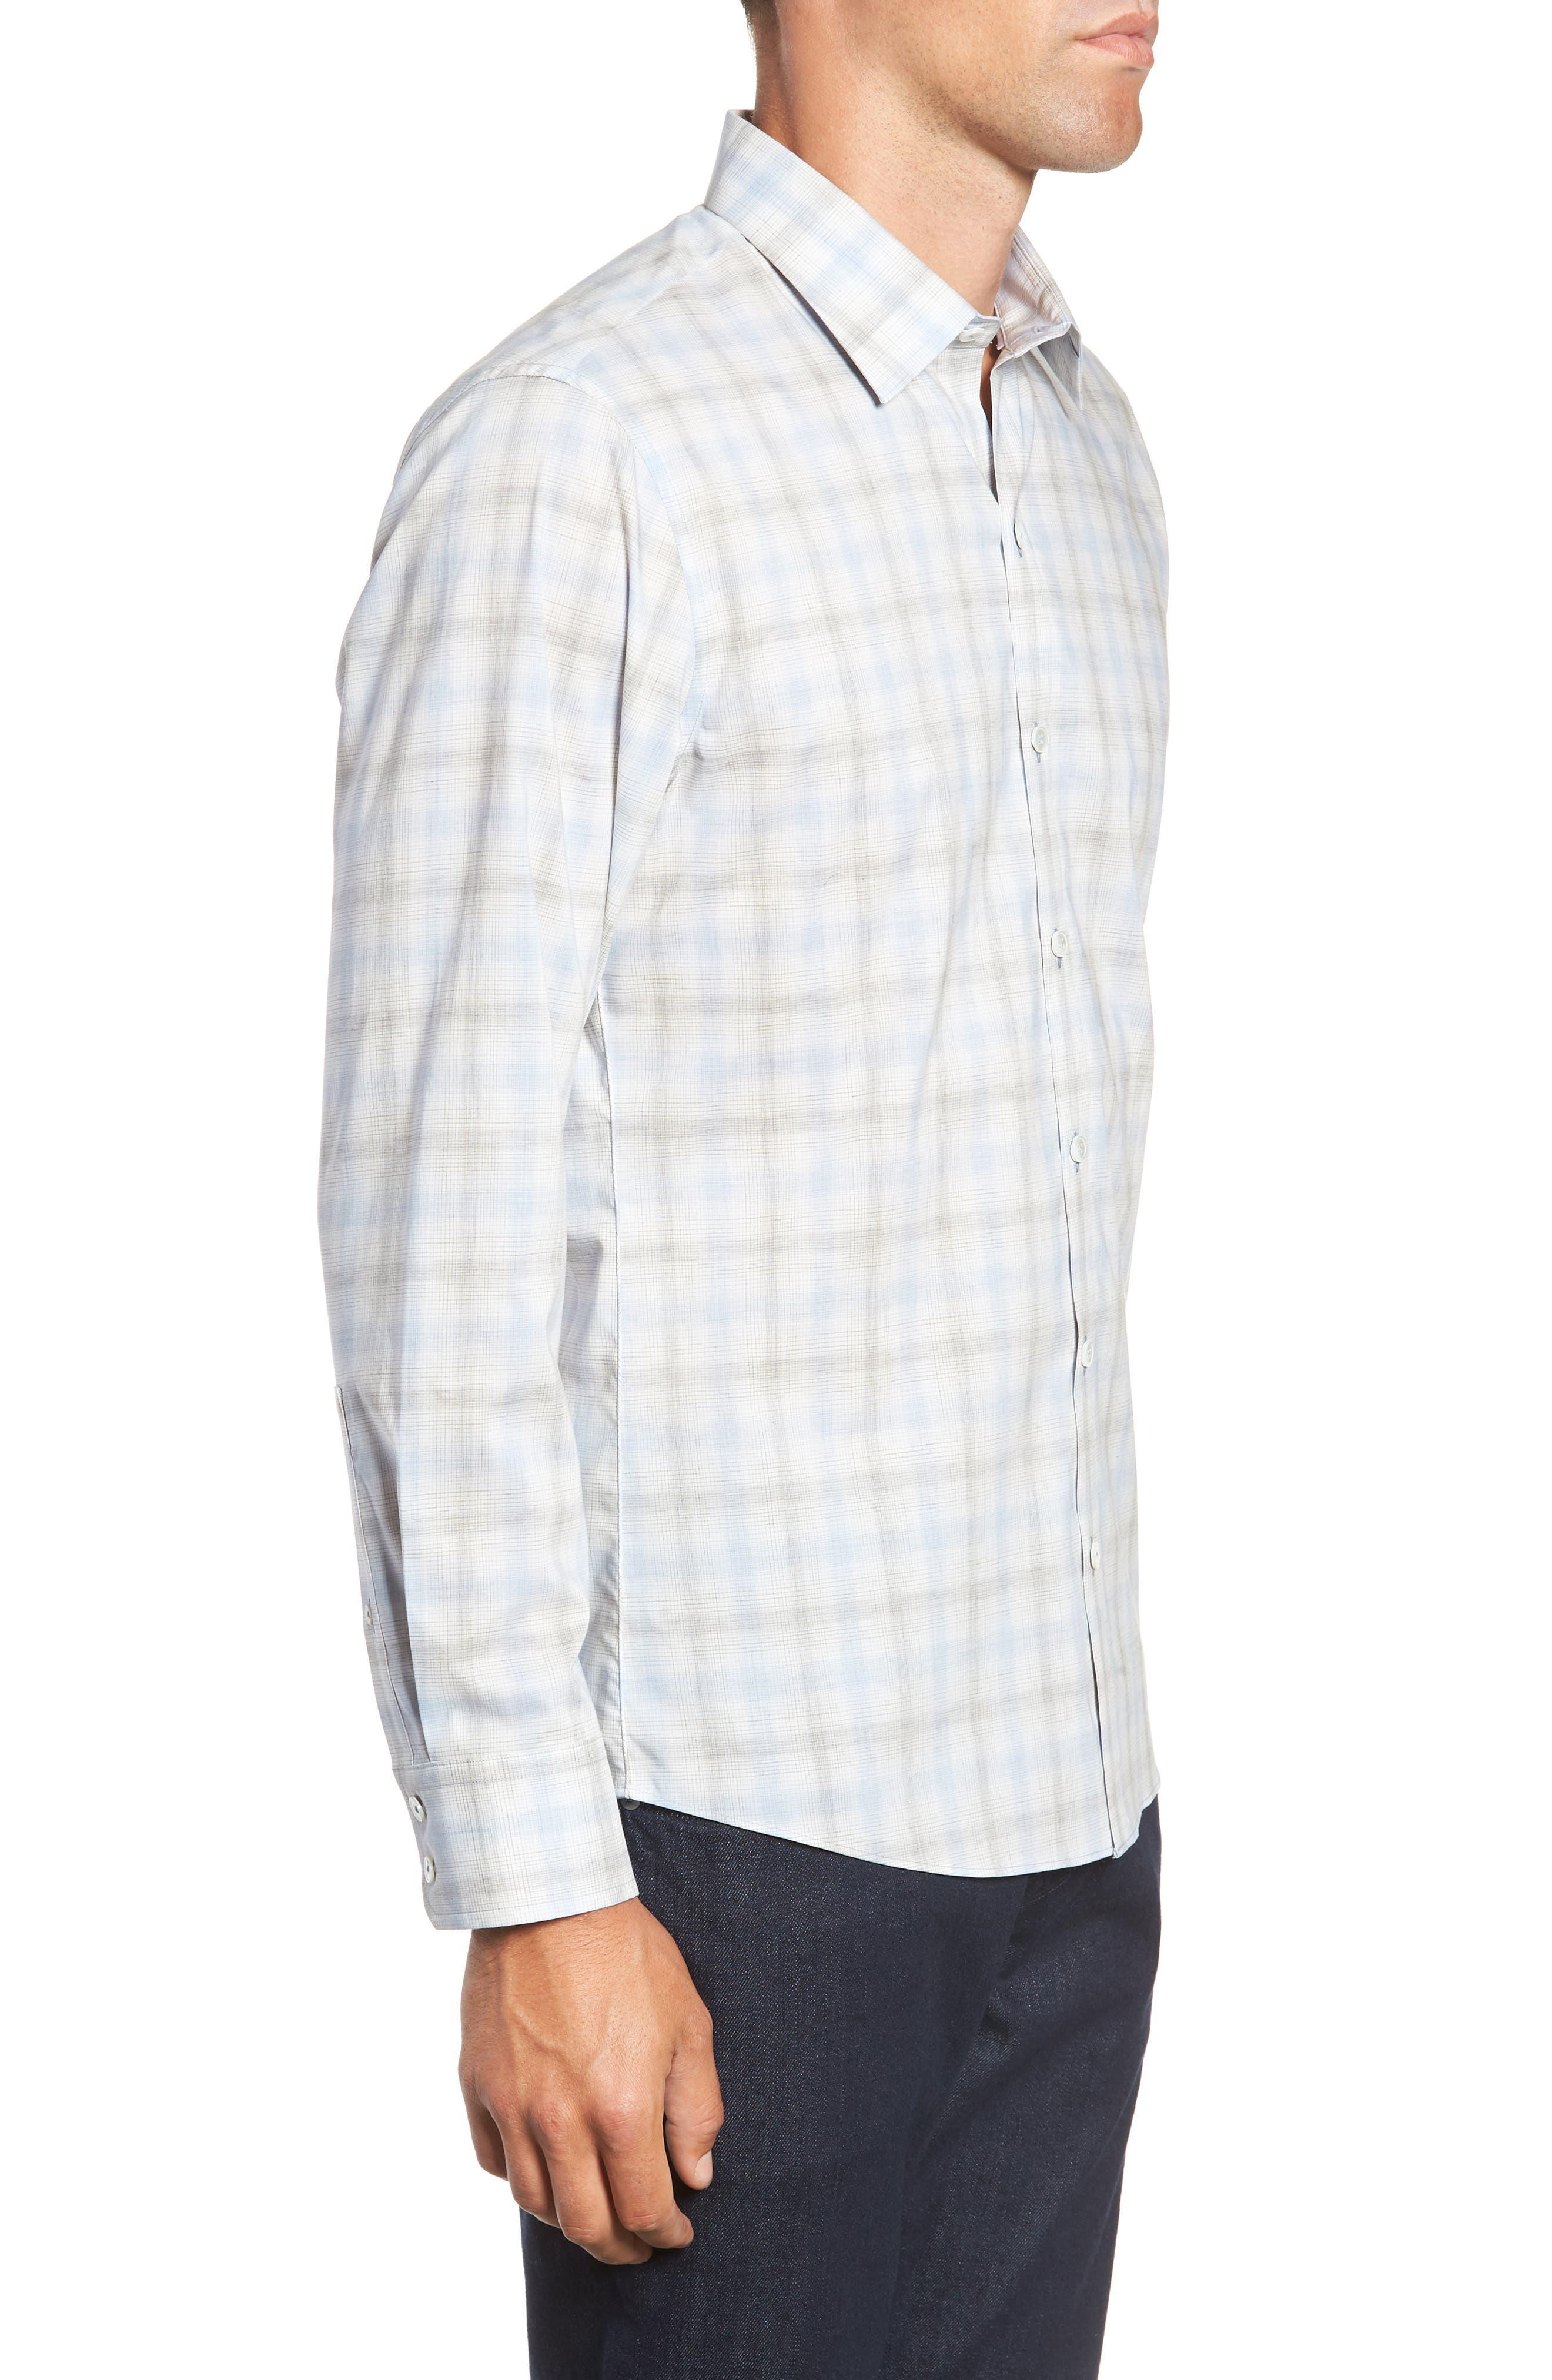 Mourad Regular Fit Sport Shirt,                             Alternate thumbnail 4, color,                             LIGHT GREY